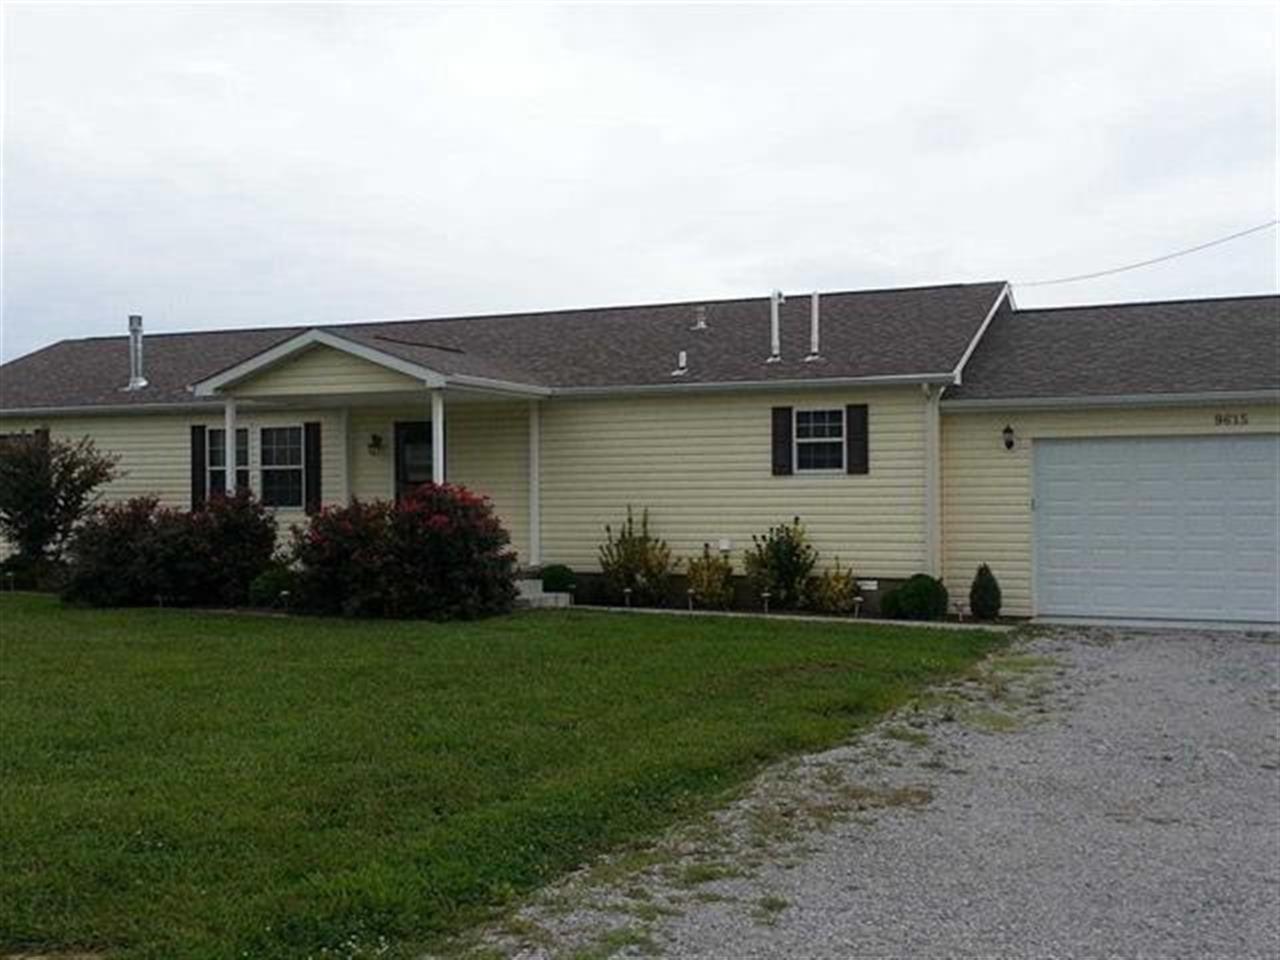 Real Estate for Sale, ListingId: 27221877, West Paducah,KY42086